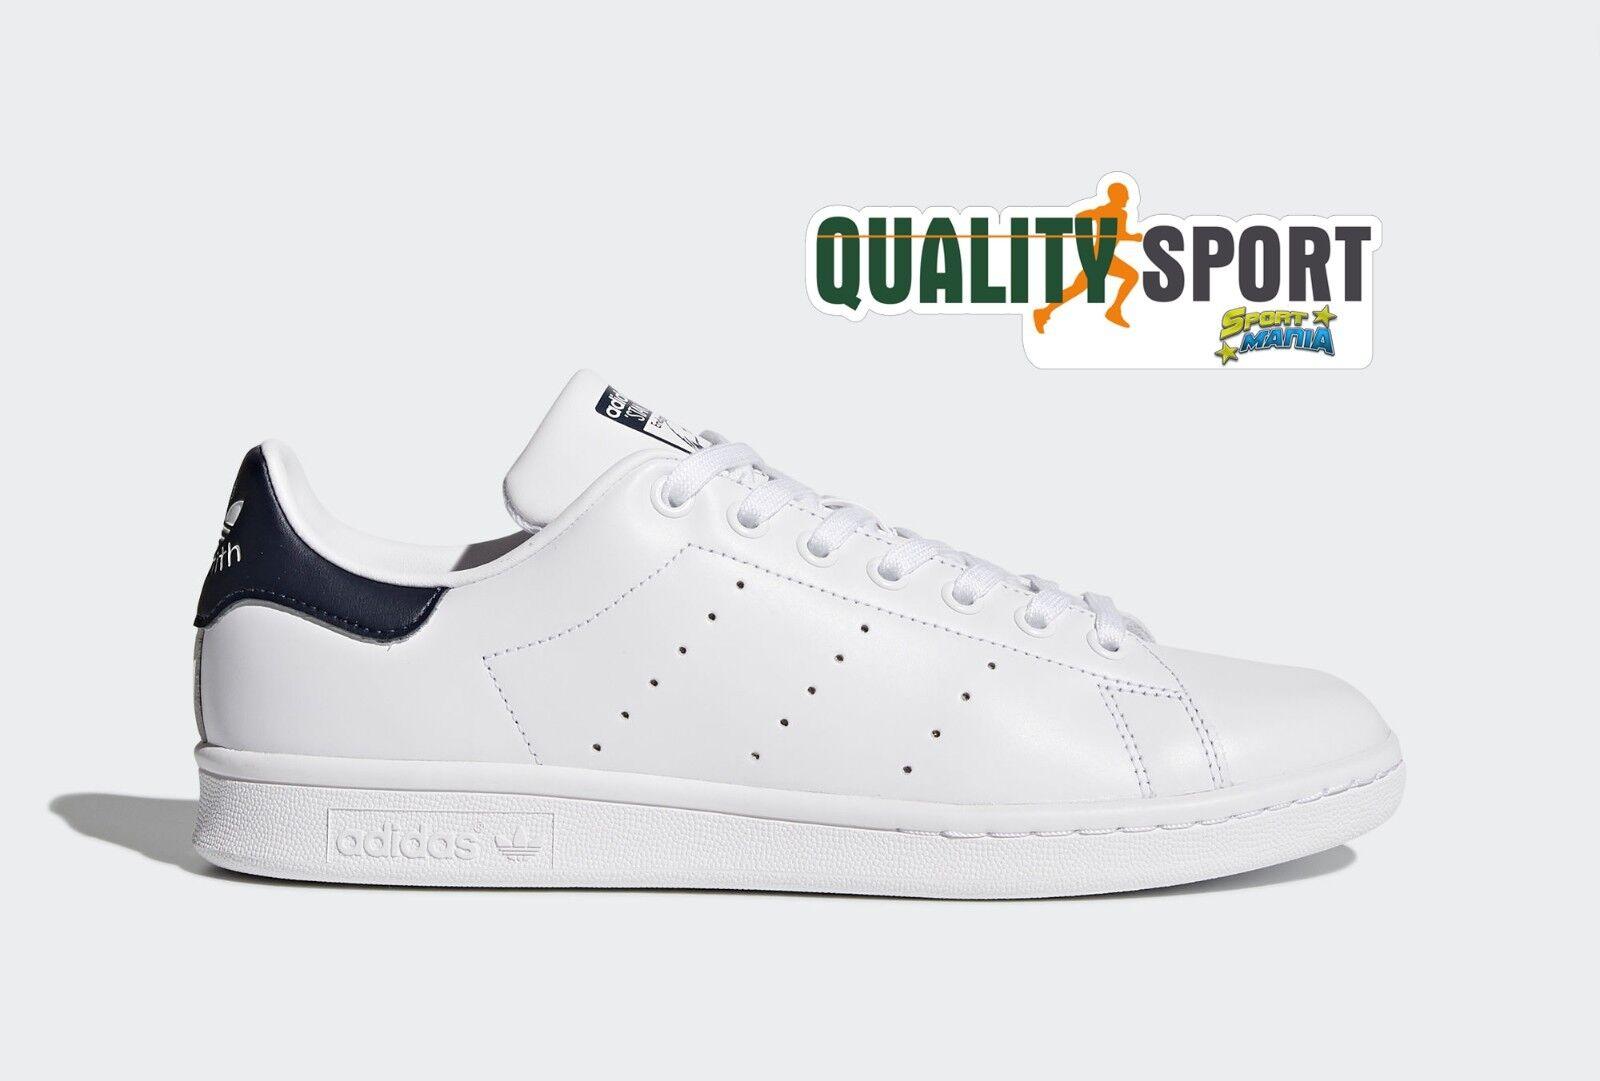 Adidas Stan Smith Bianco Blu Scarpe Shoes Uomo Sportive Sneakers M20325 2018